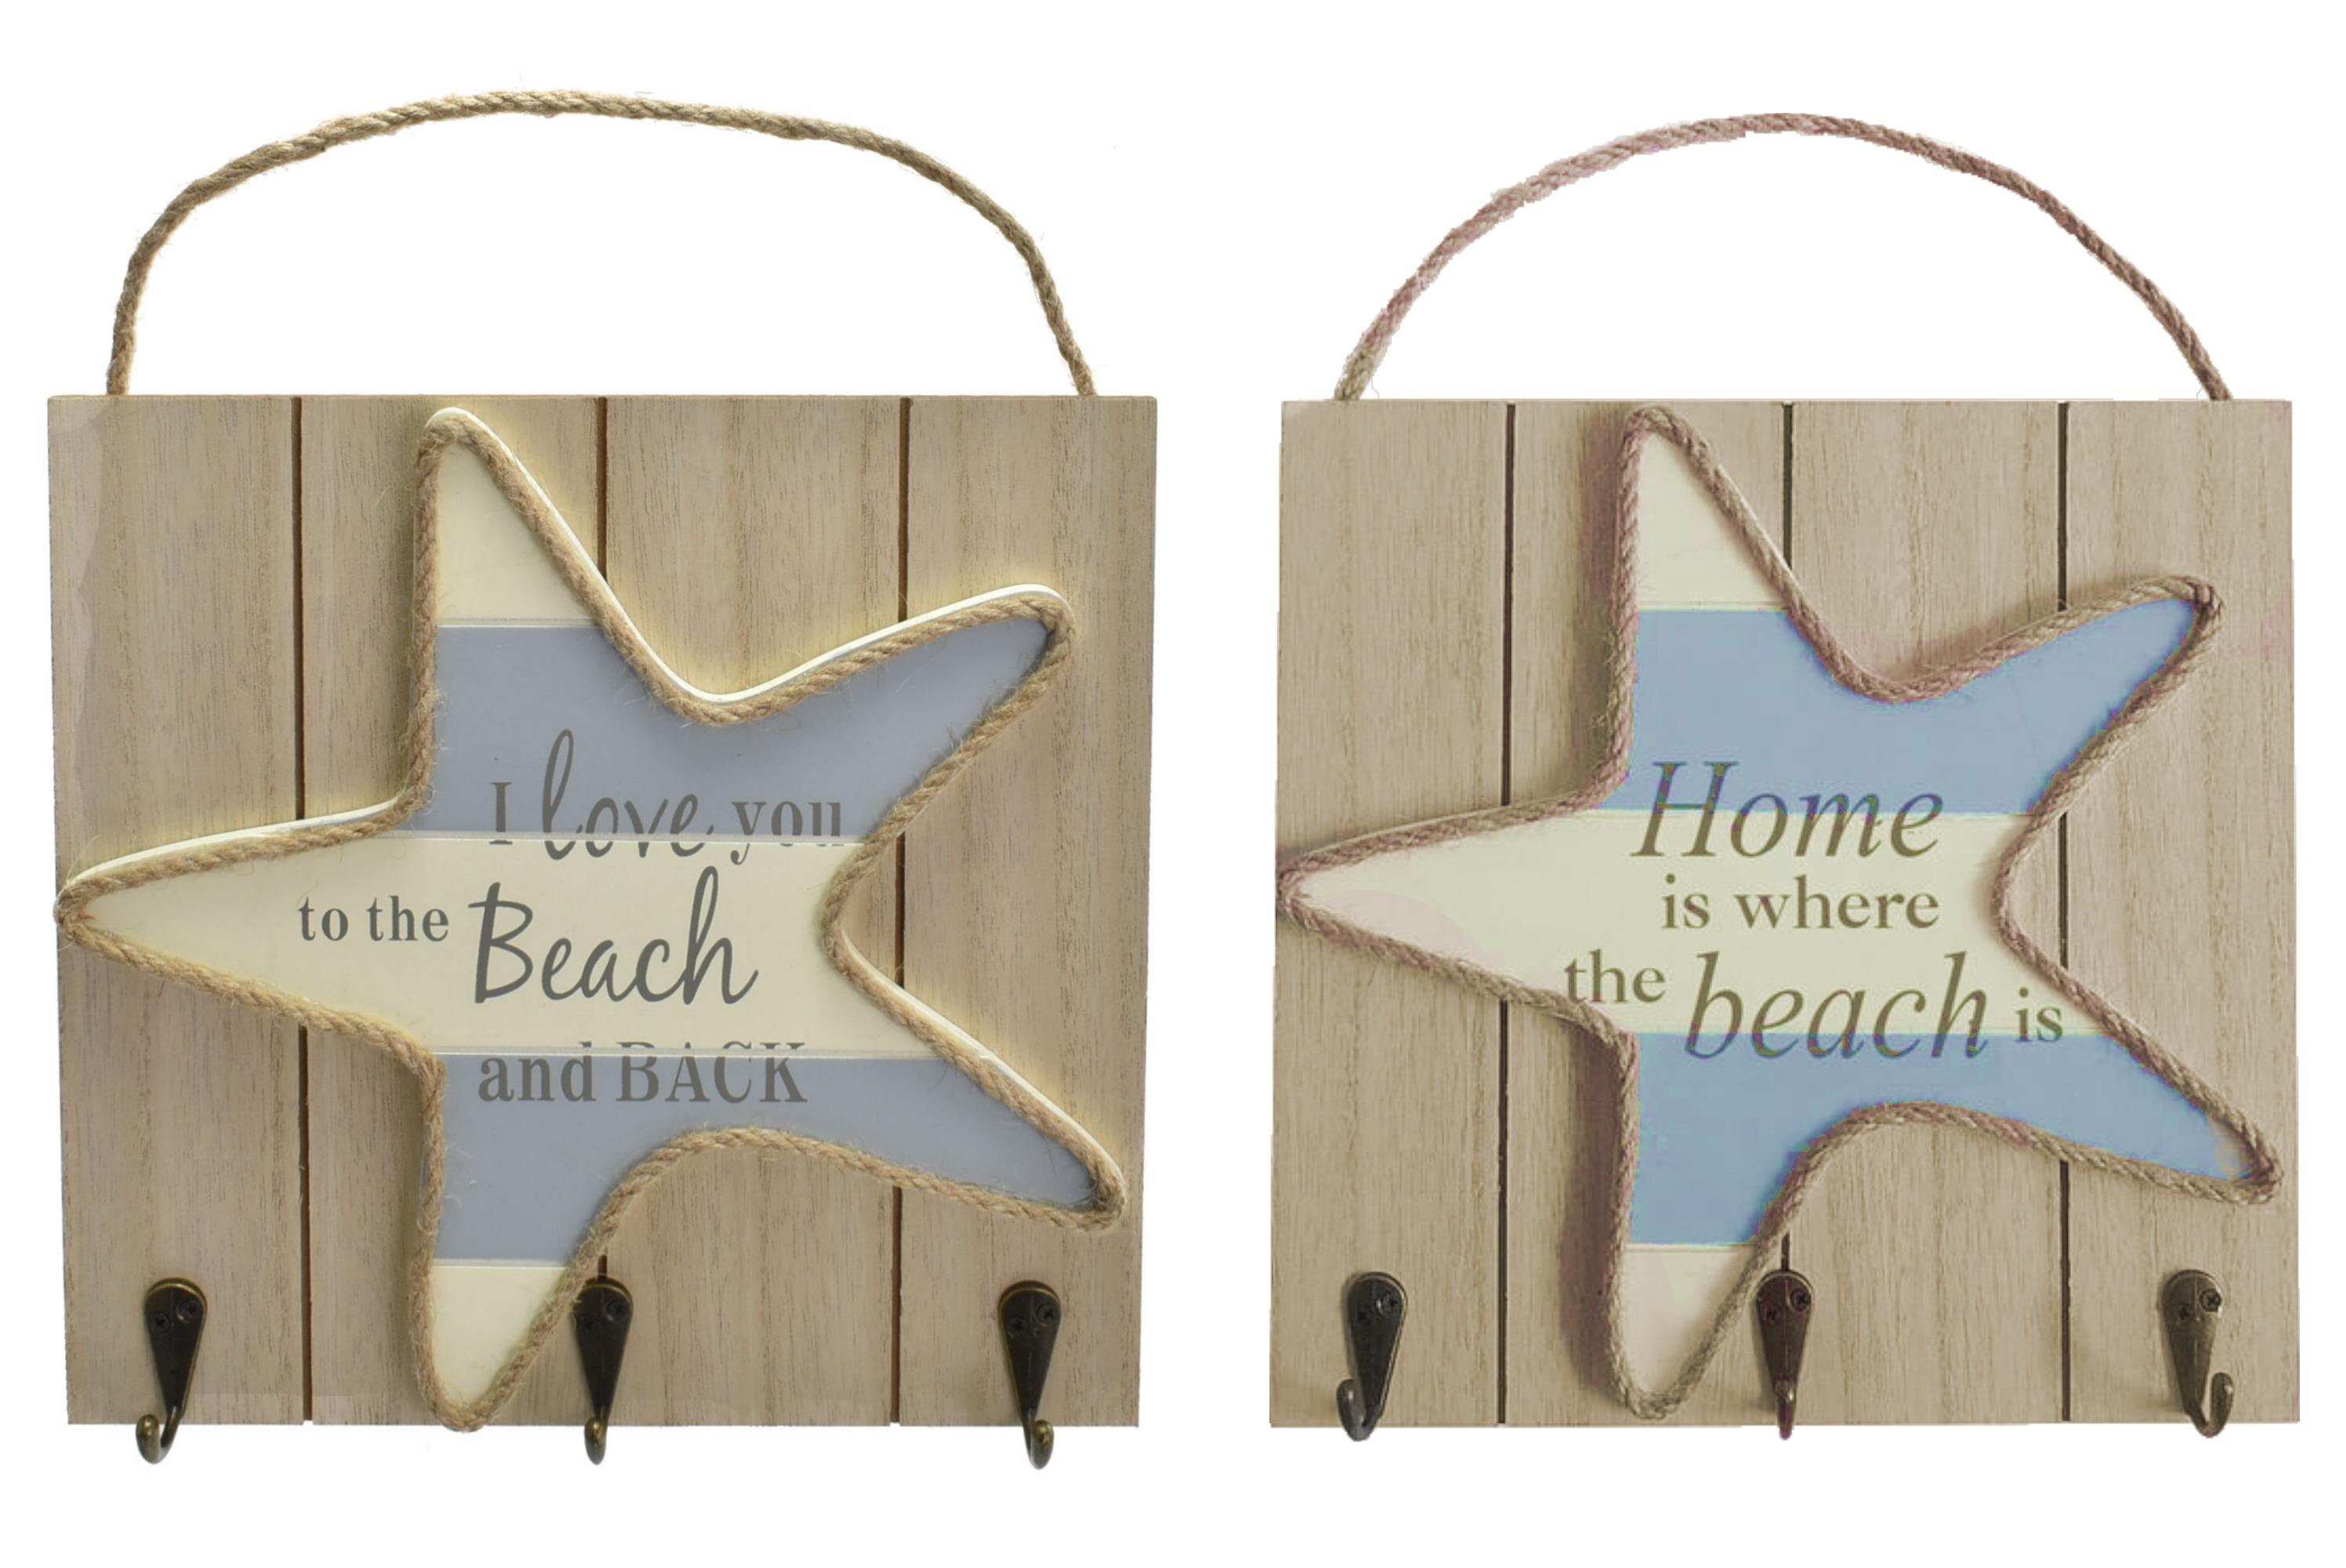 23x23cm Starfish Hanging Sign 2 Assorted Designs